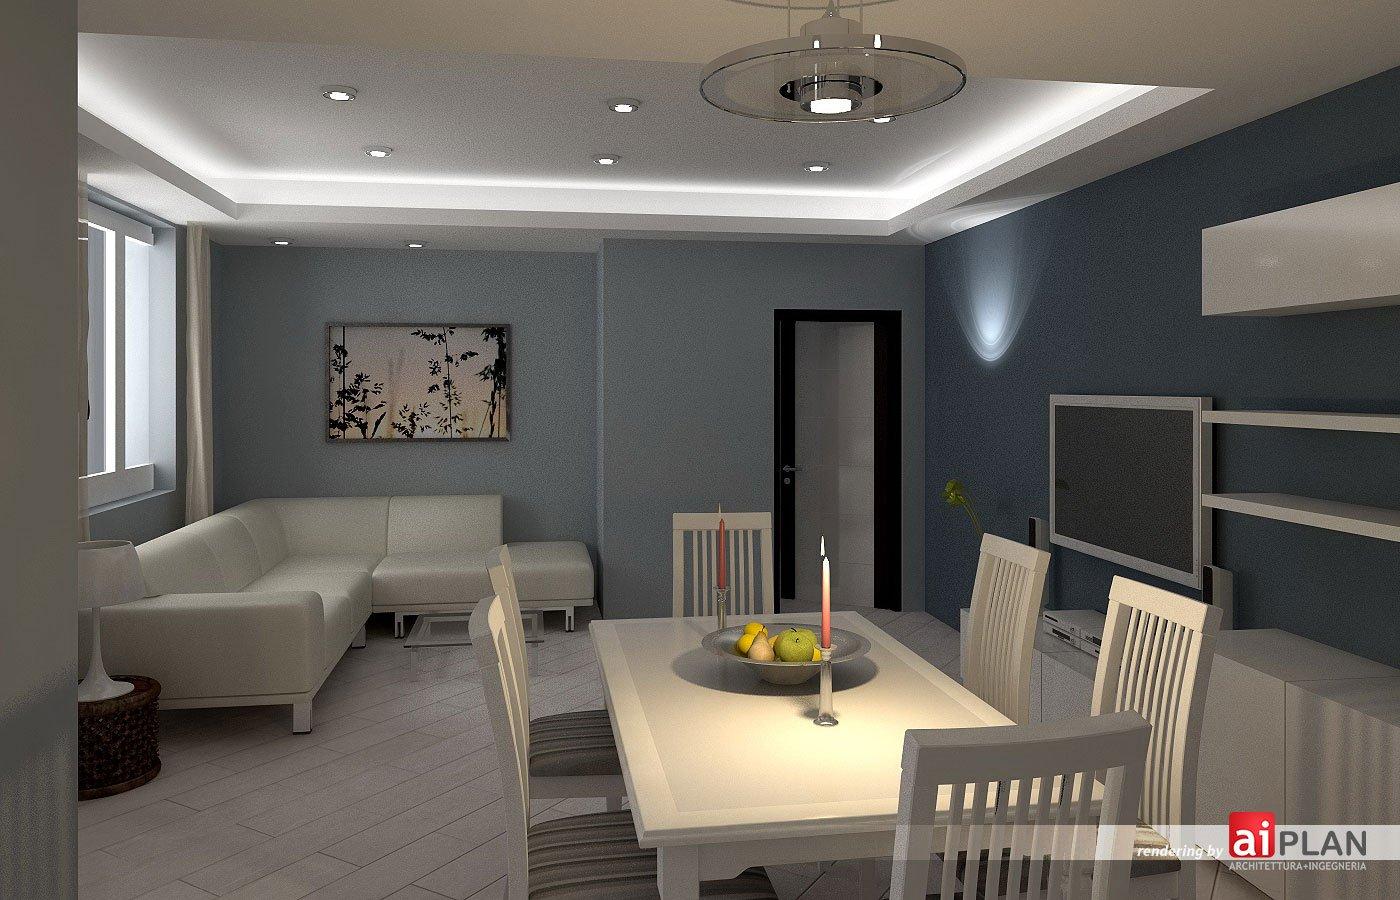 Aiplan architettura e ingegneria aiplan architettura for Progetti design interni